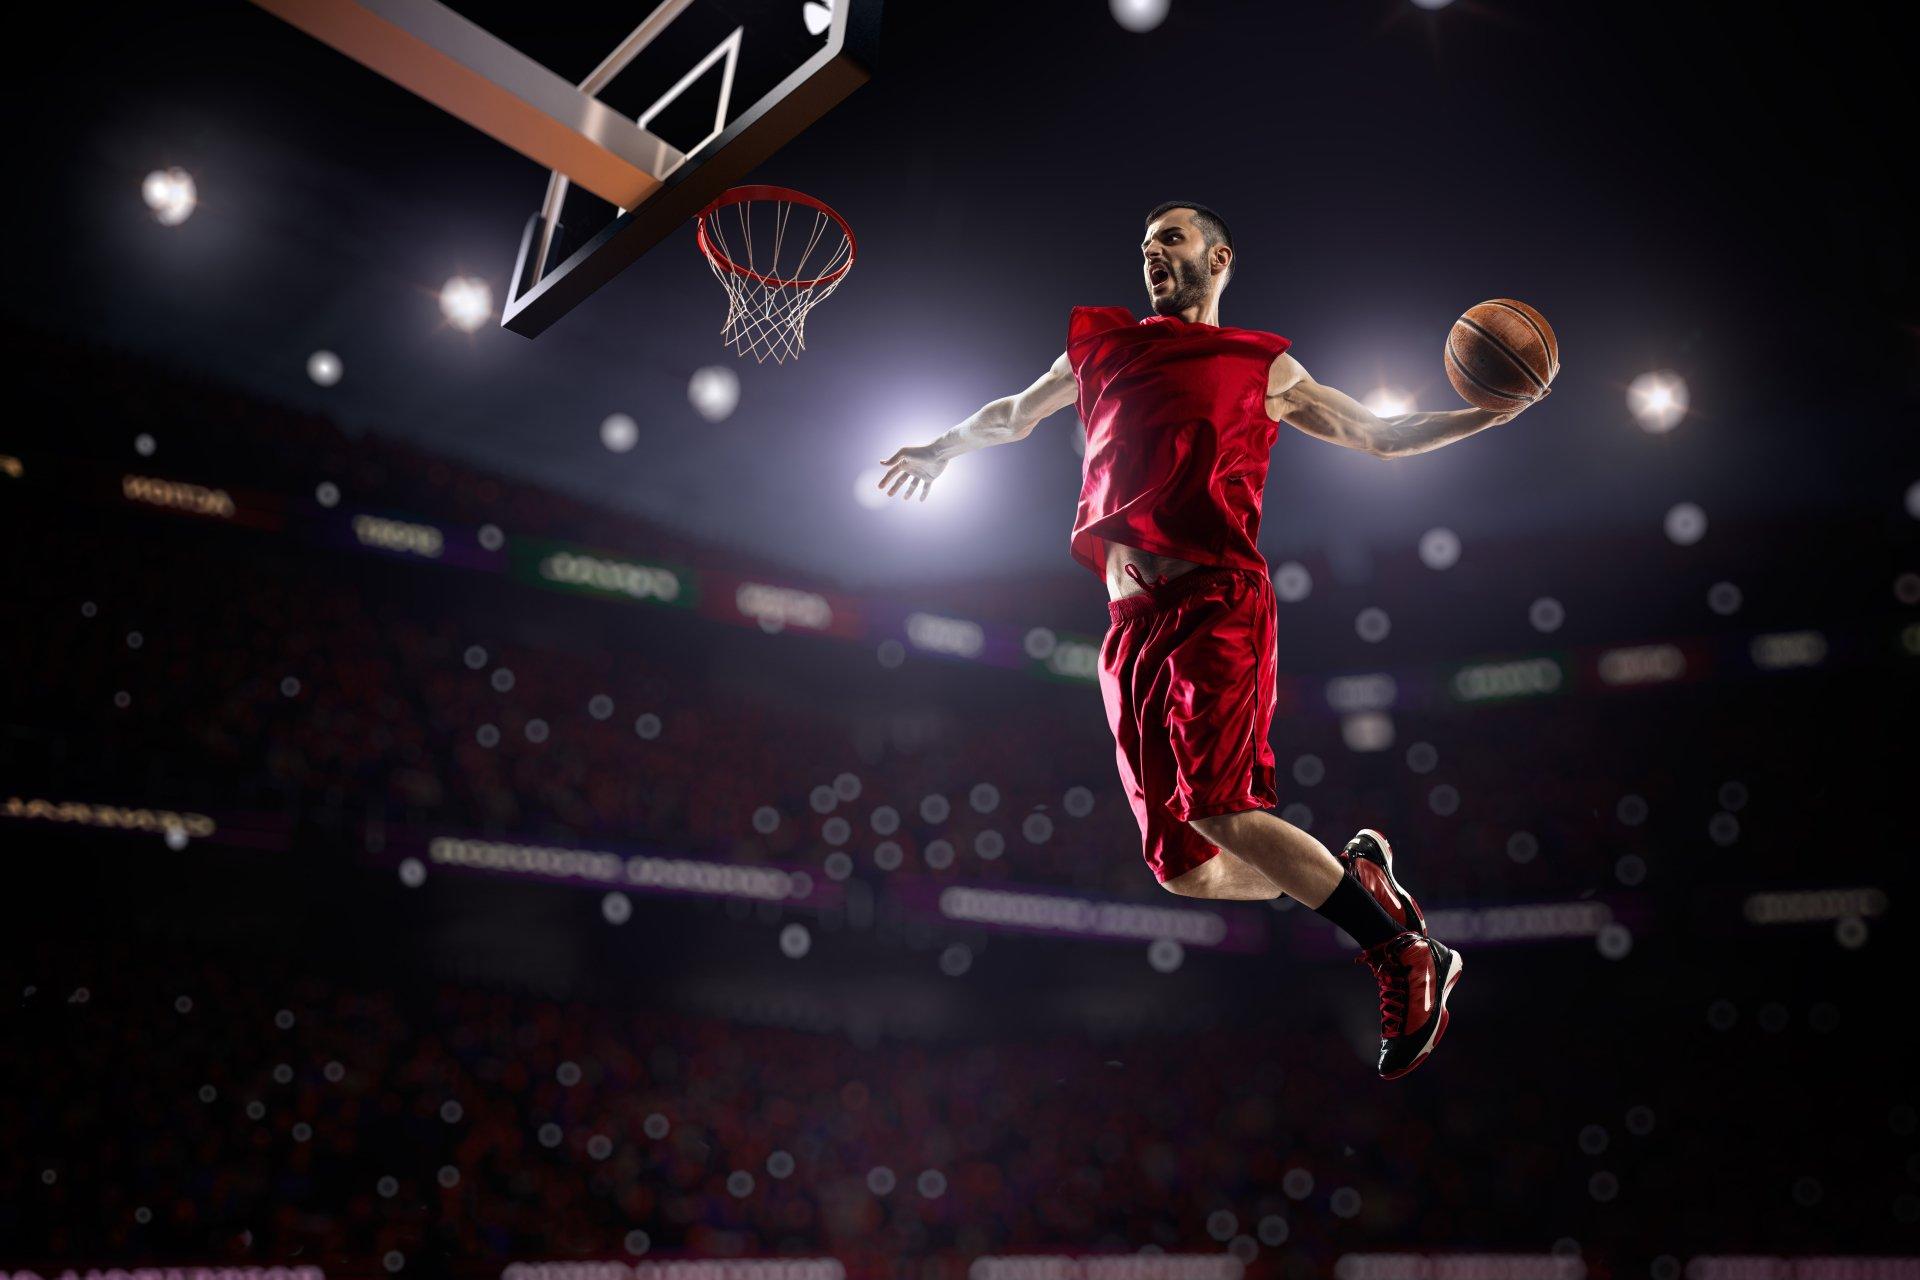 Kits de arte JMINE Div 5D para baloncesto, deportes, luz completa de diamante, pintura de punto de cruz, retrato de alta calidad, pintura 3D de diamantes